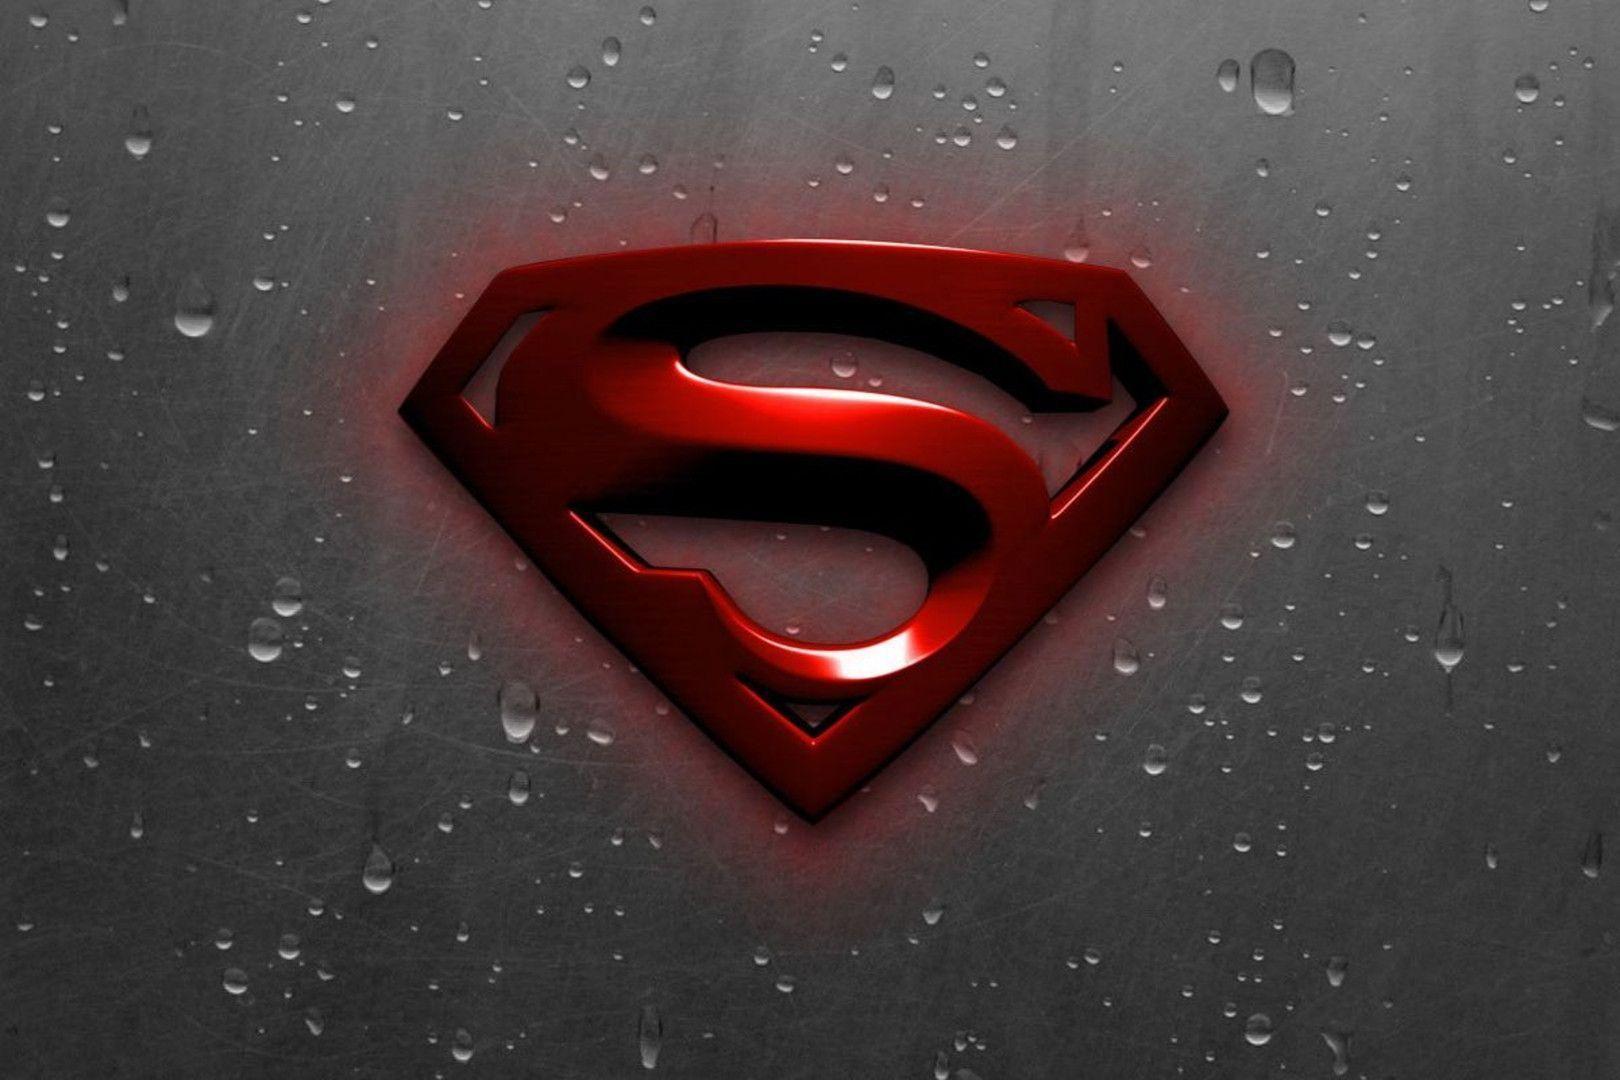 Superman wallpapers 1920x1080 wallpaper cave wallpapers for superman logo wallpaper hd 1920x1080 voltagebd Gallery